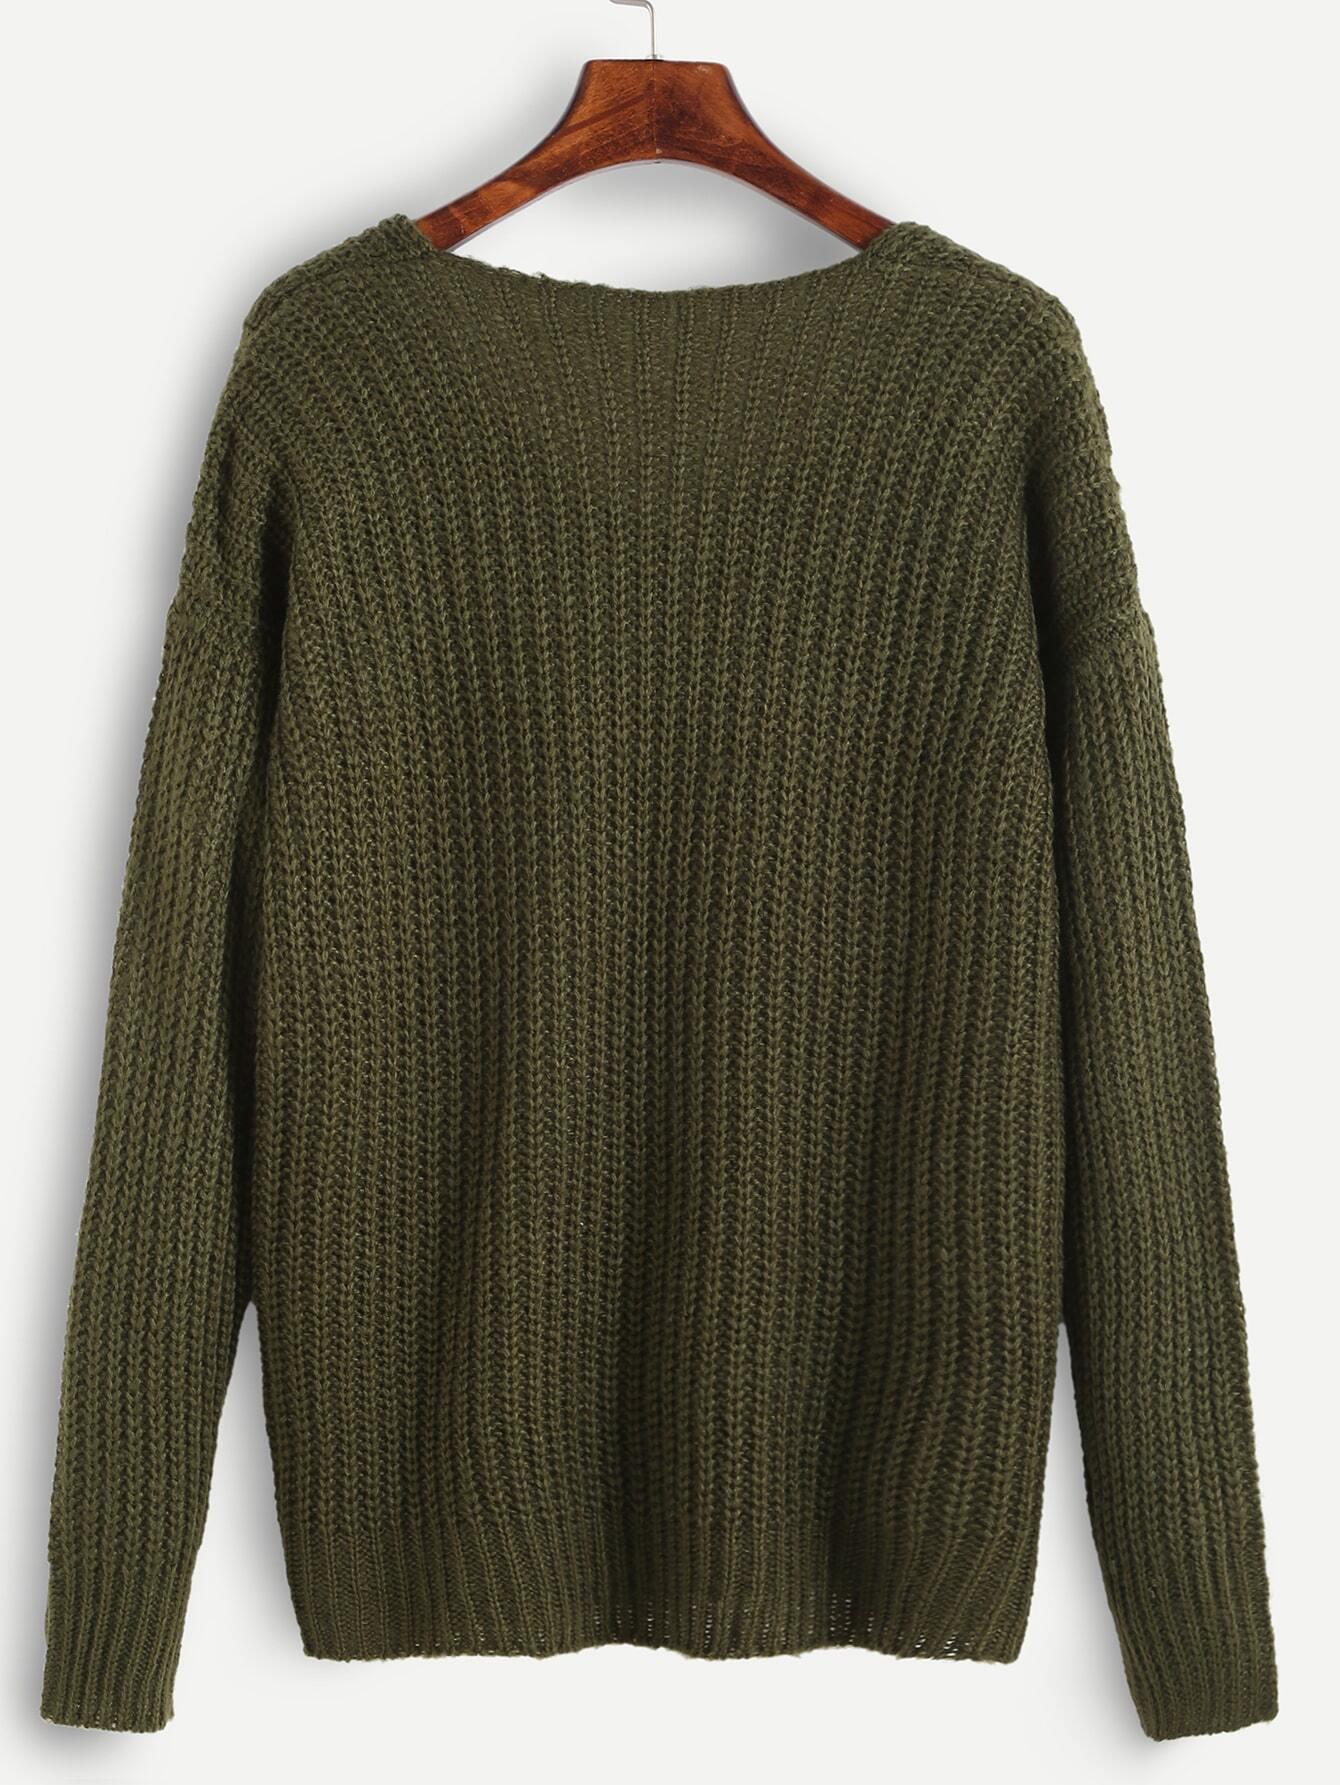 Ribbed Knit Drop Shoulder Sweater -SheIn(Sheinside)